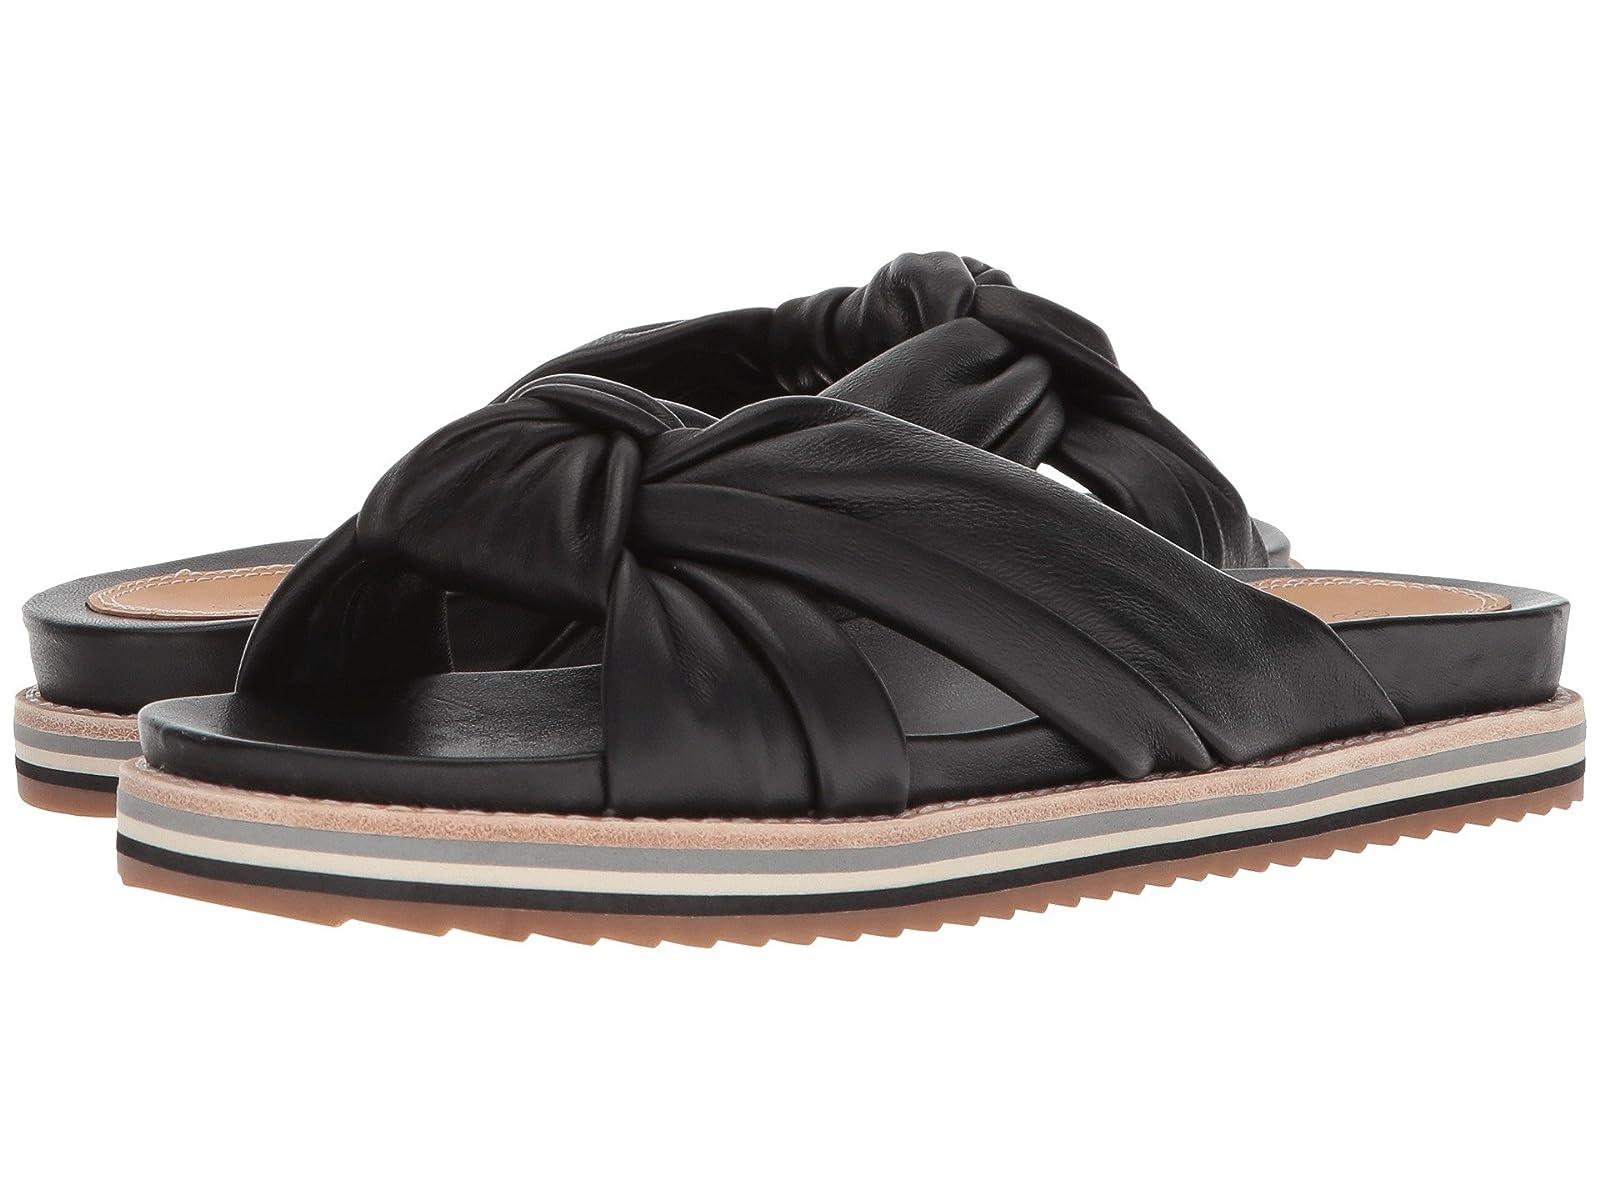 Bill Blass PadgetCheap and distinctive eye-catching shoes